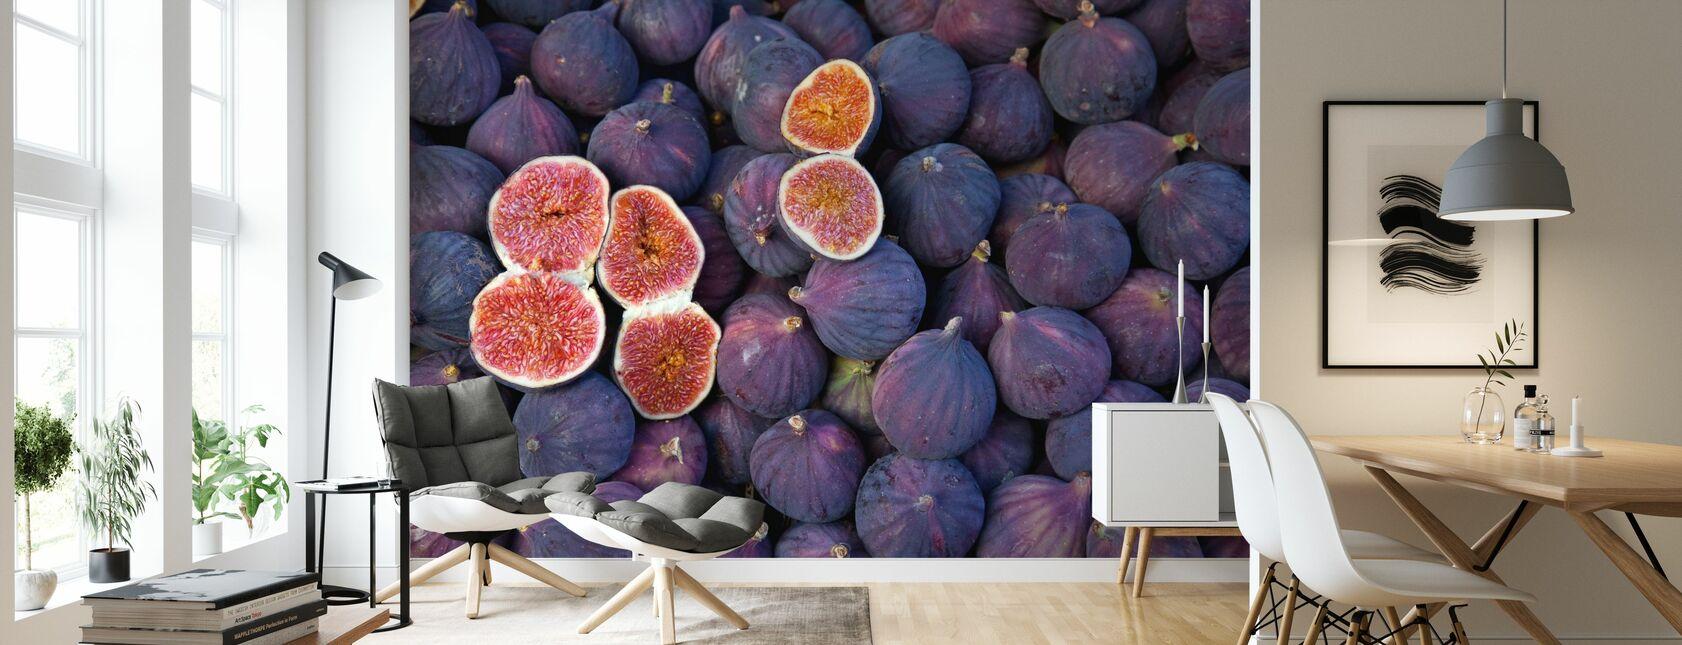 beautiful Figs - Wallpaper - Living Room